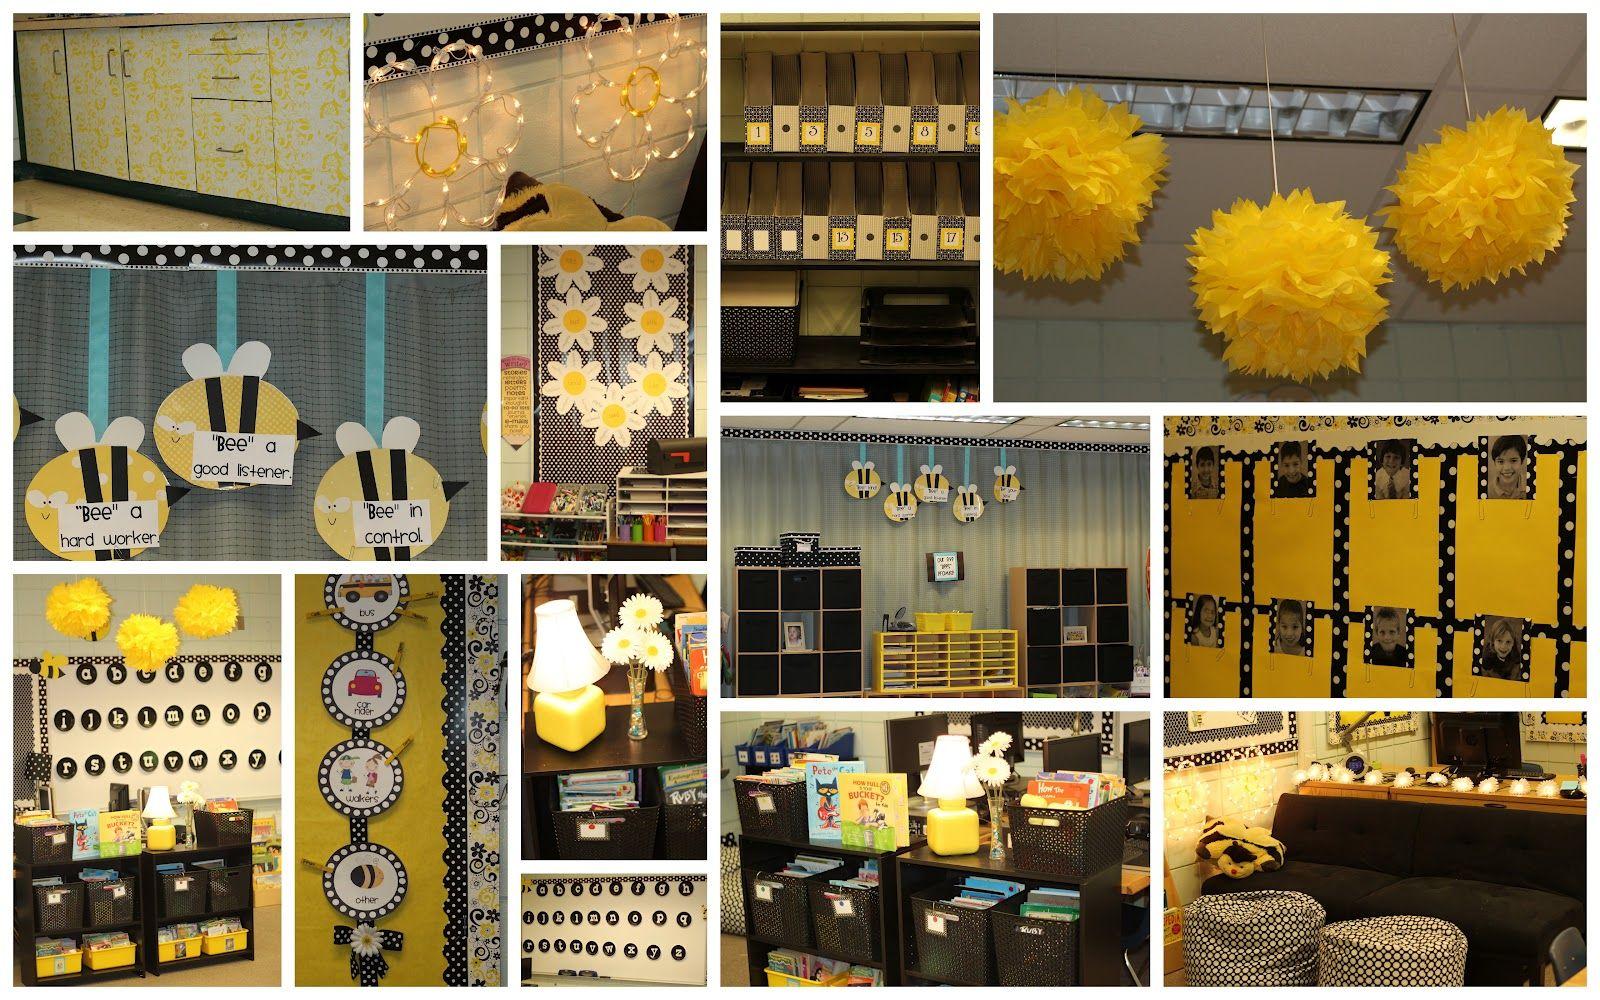 6th Grade English Classroom Decorations ~ Th grade science classroom decorations ideas about